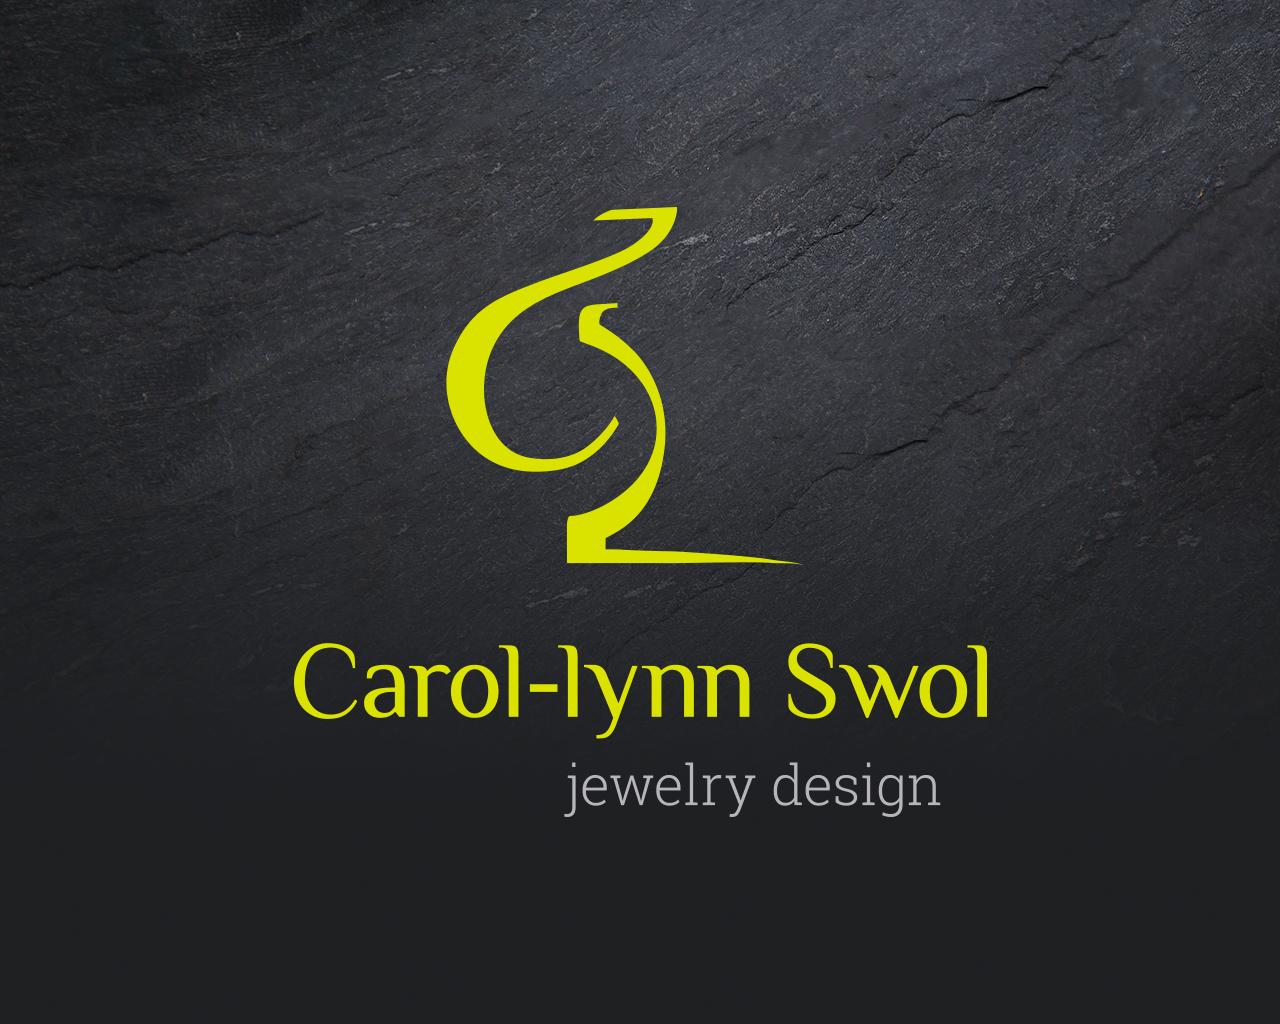 Carol-lynn Swol Jewelry Design